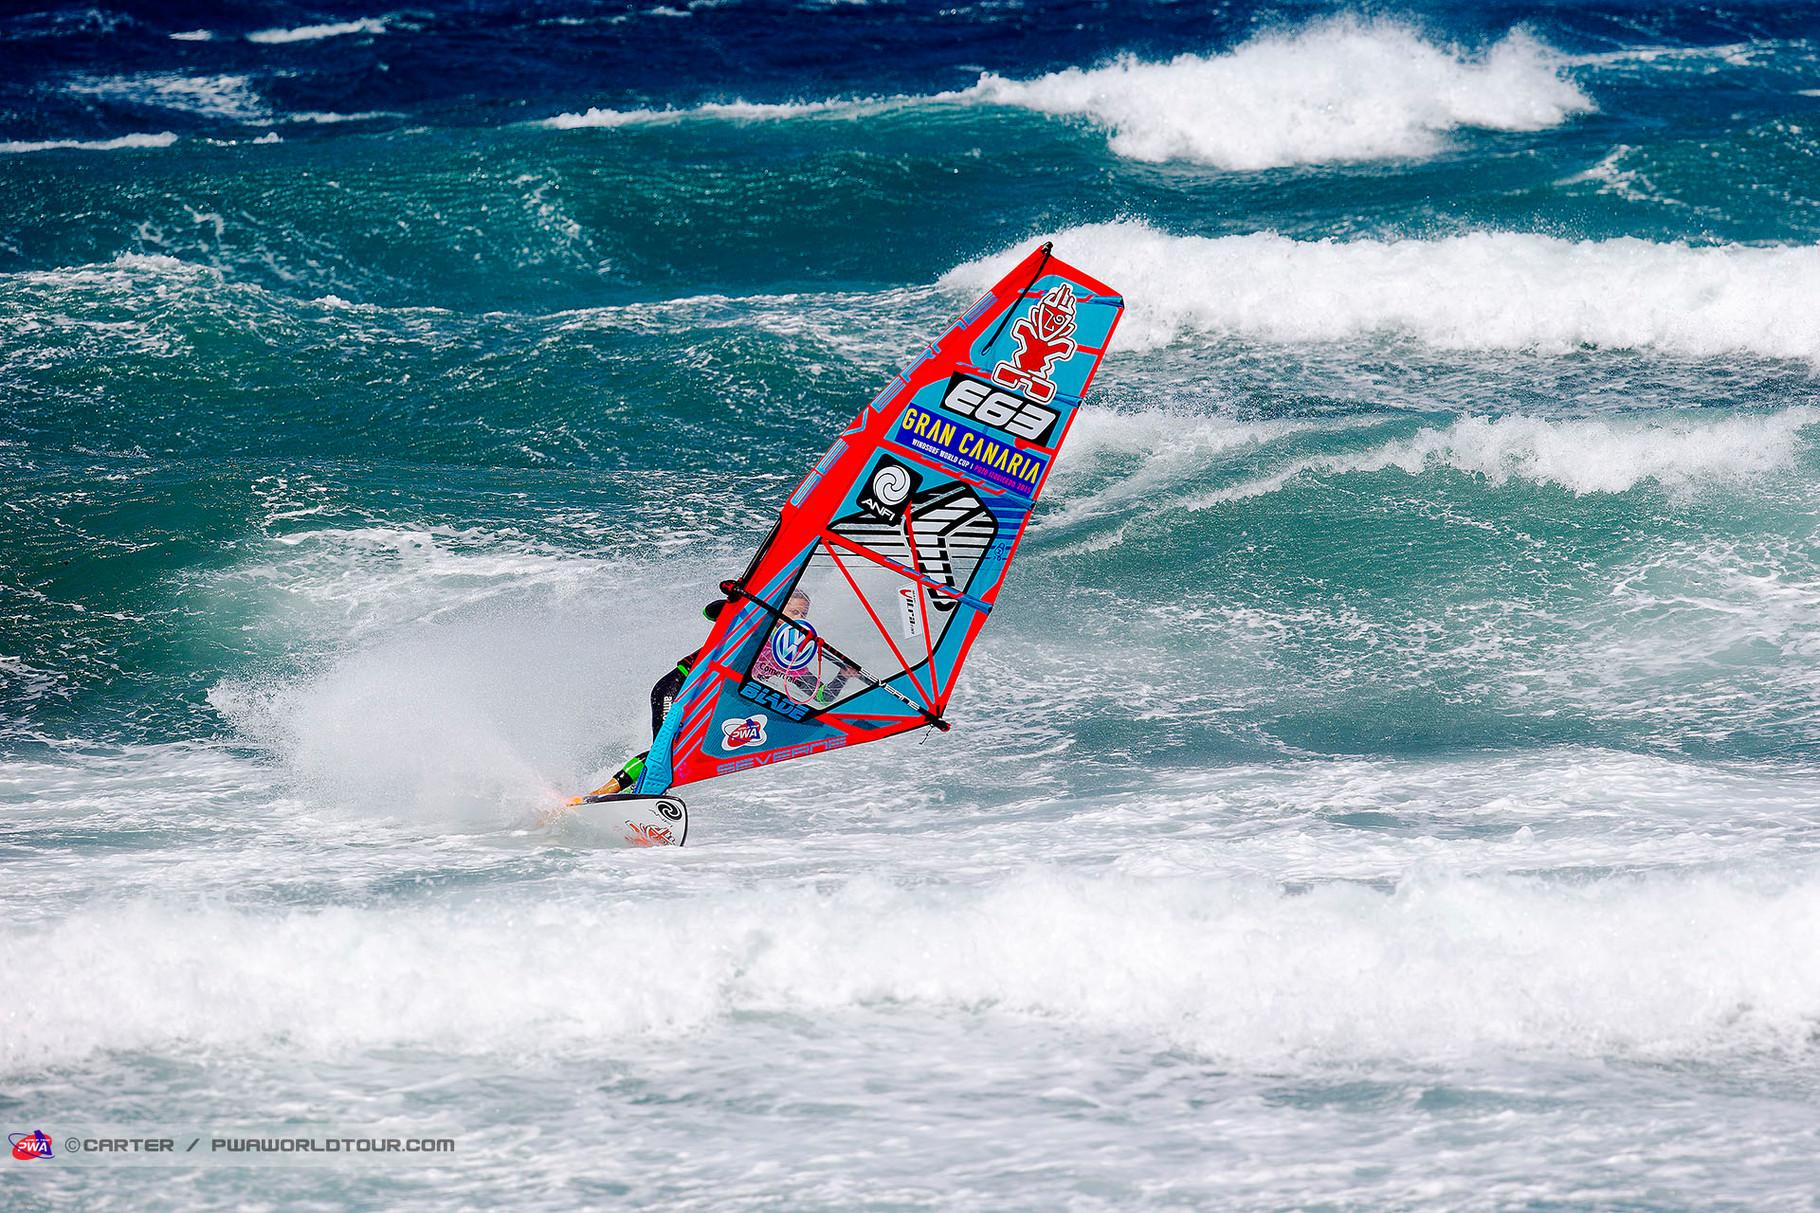 Iballa Ruano Moreno wird Zweite. ©Carter PWA